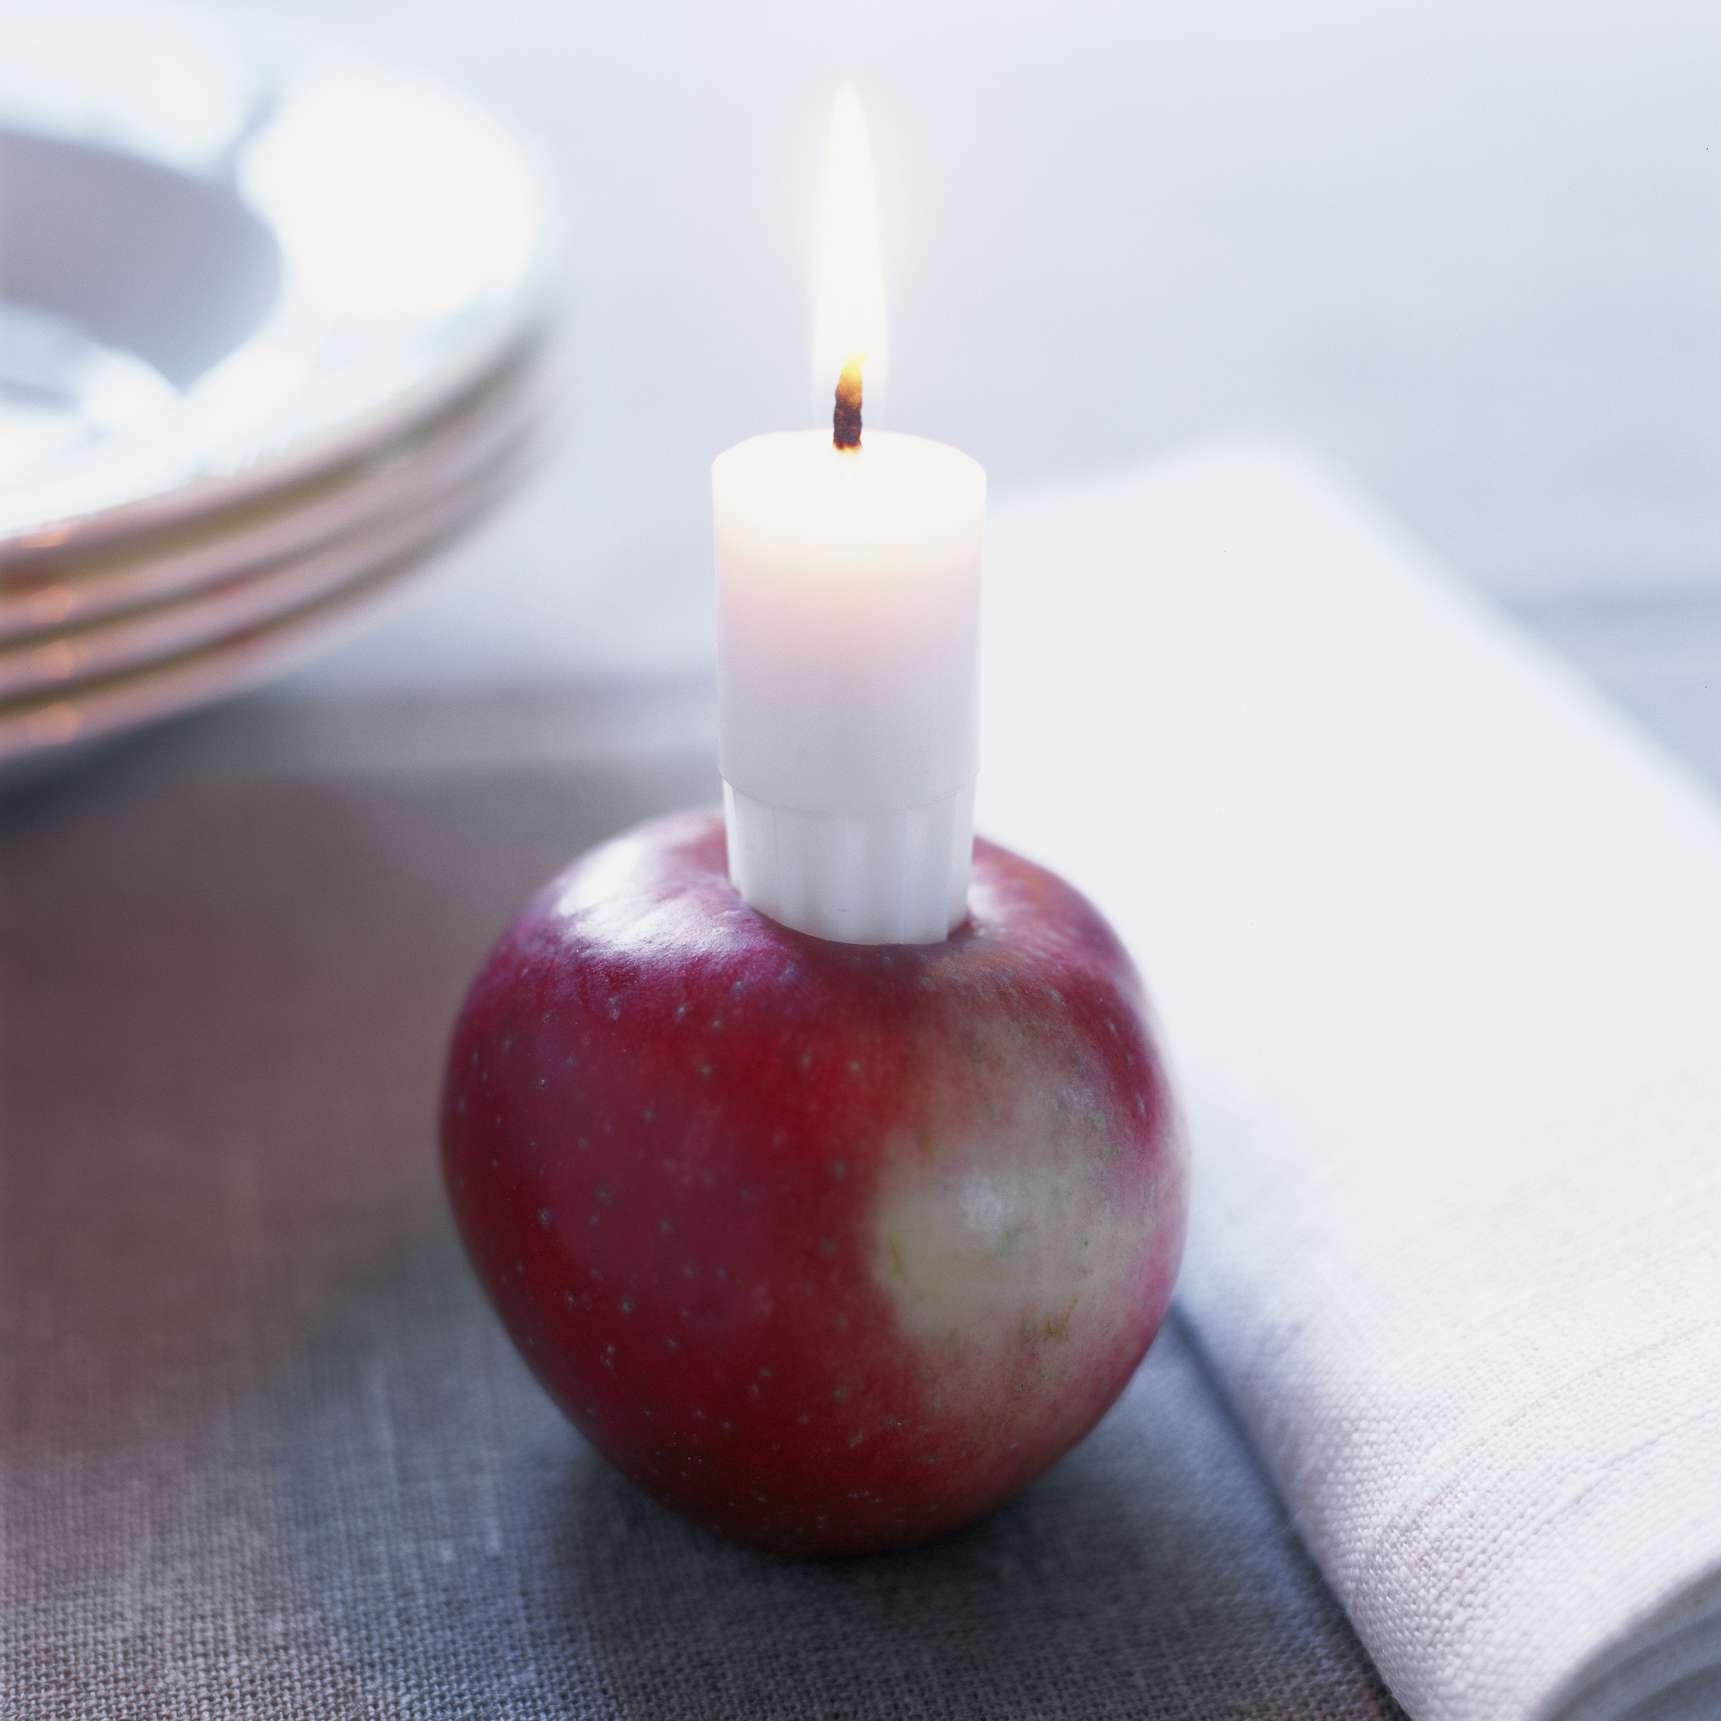 Apple candleholder